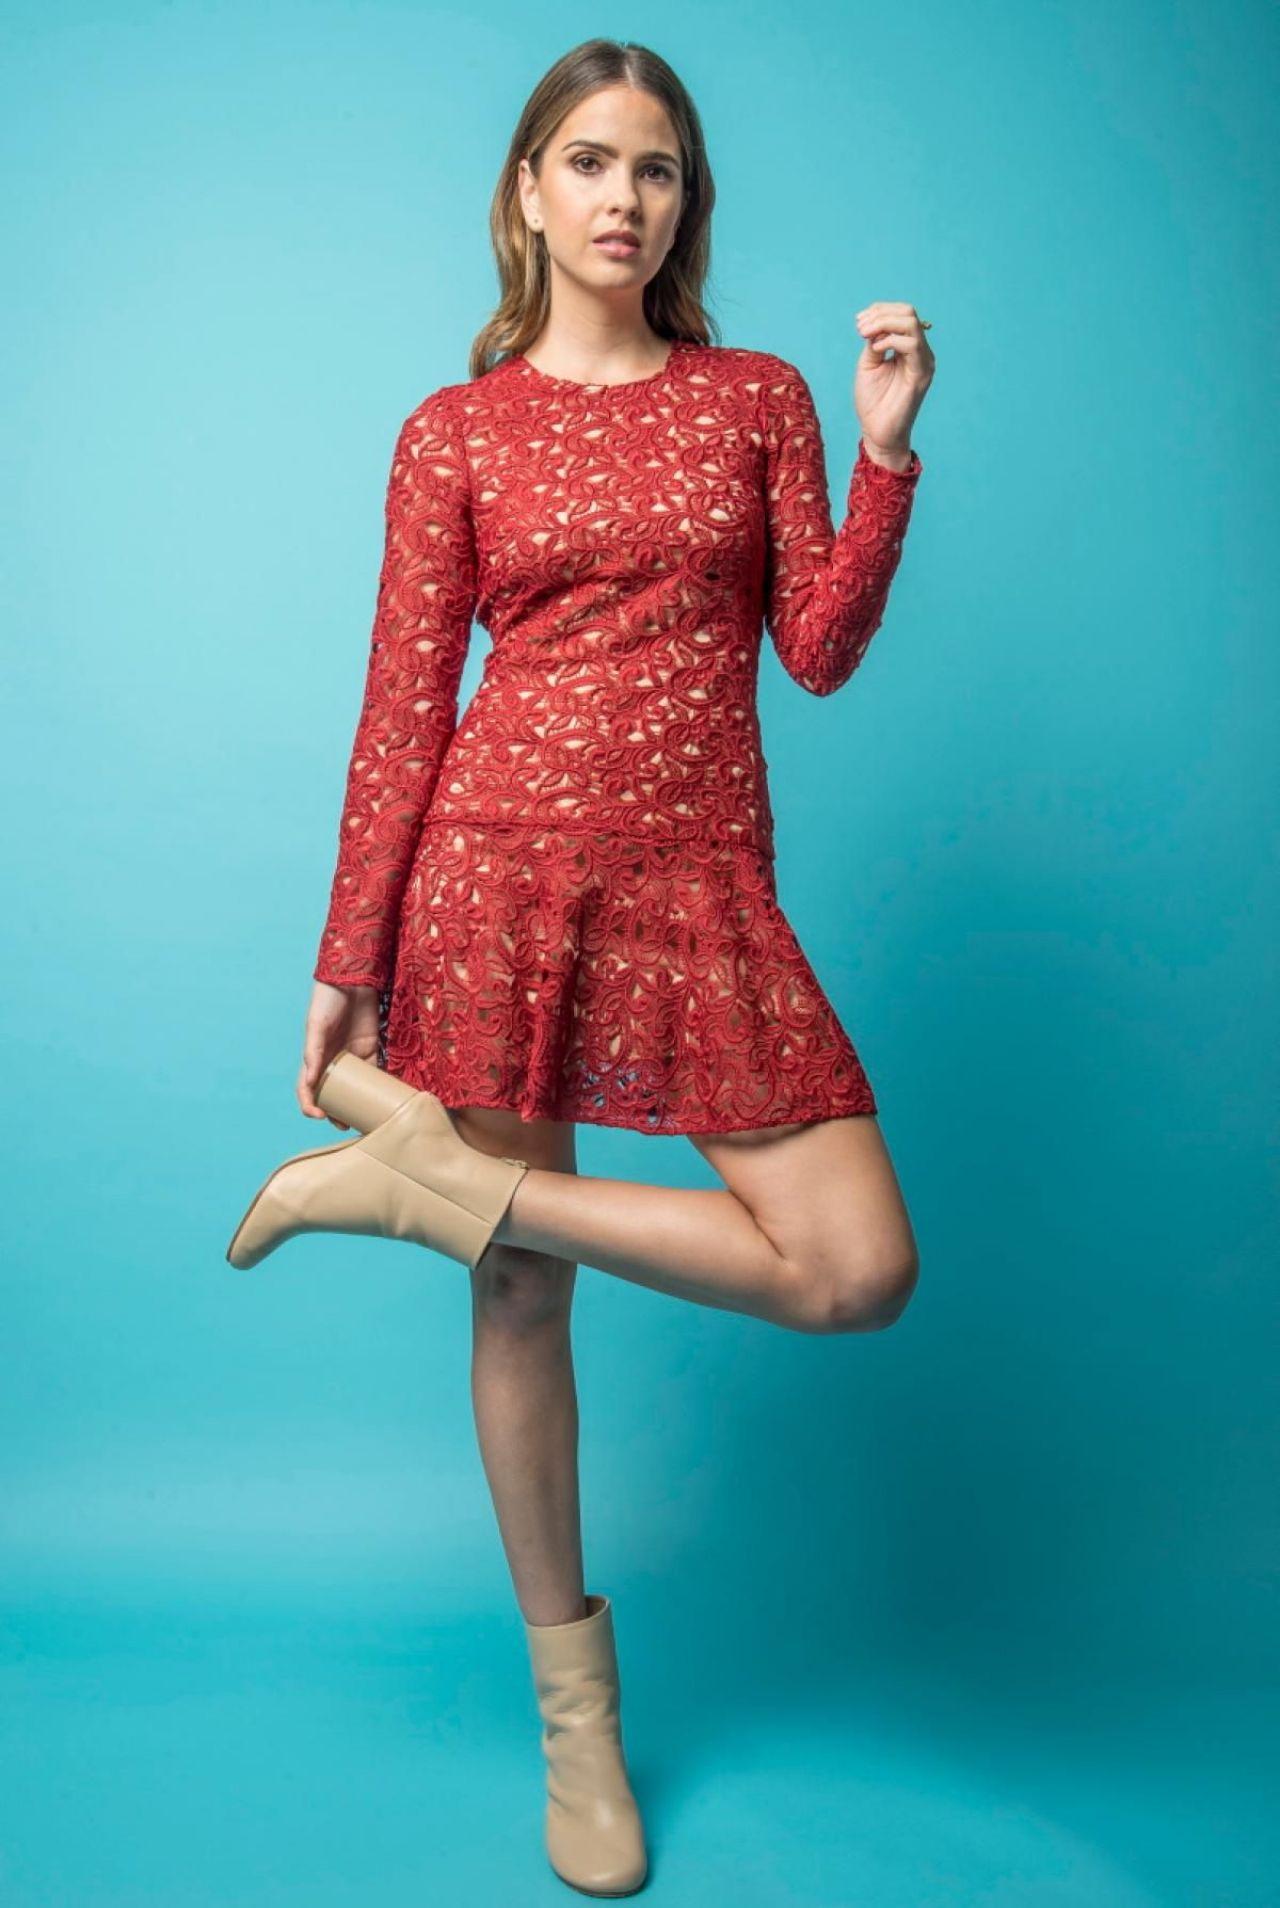 L.H. Guillaud Naked,Elena Melnik Sexy. 2018-2019 celebrityes photos leaks! Sex clips Poll britney spears vs scarlett johansson,Kate bock fappening